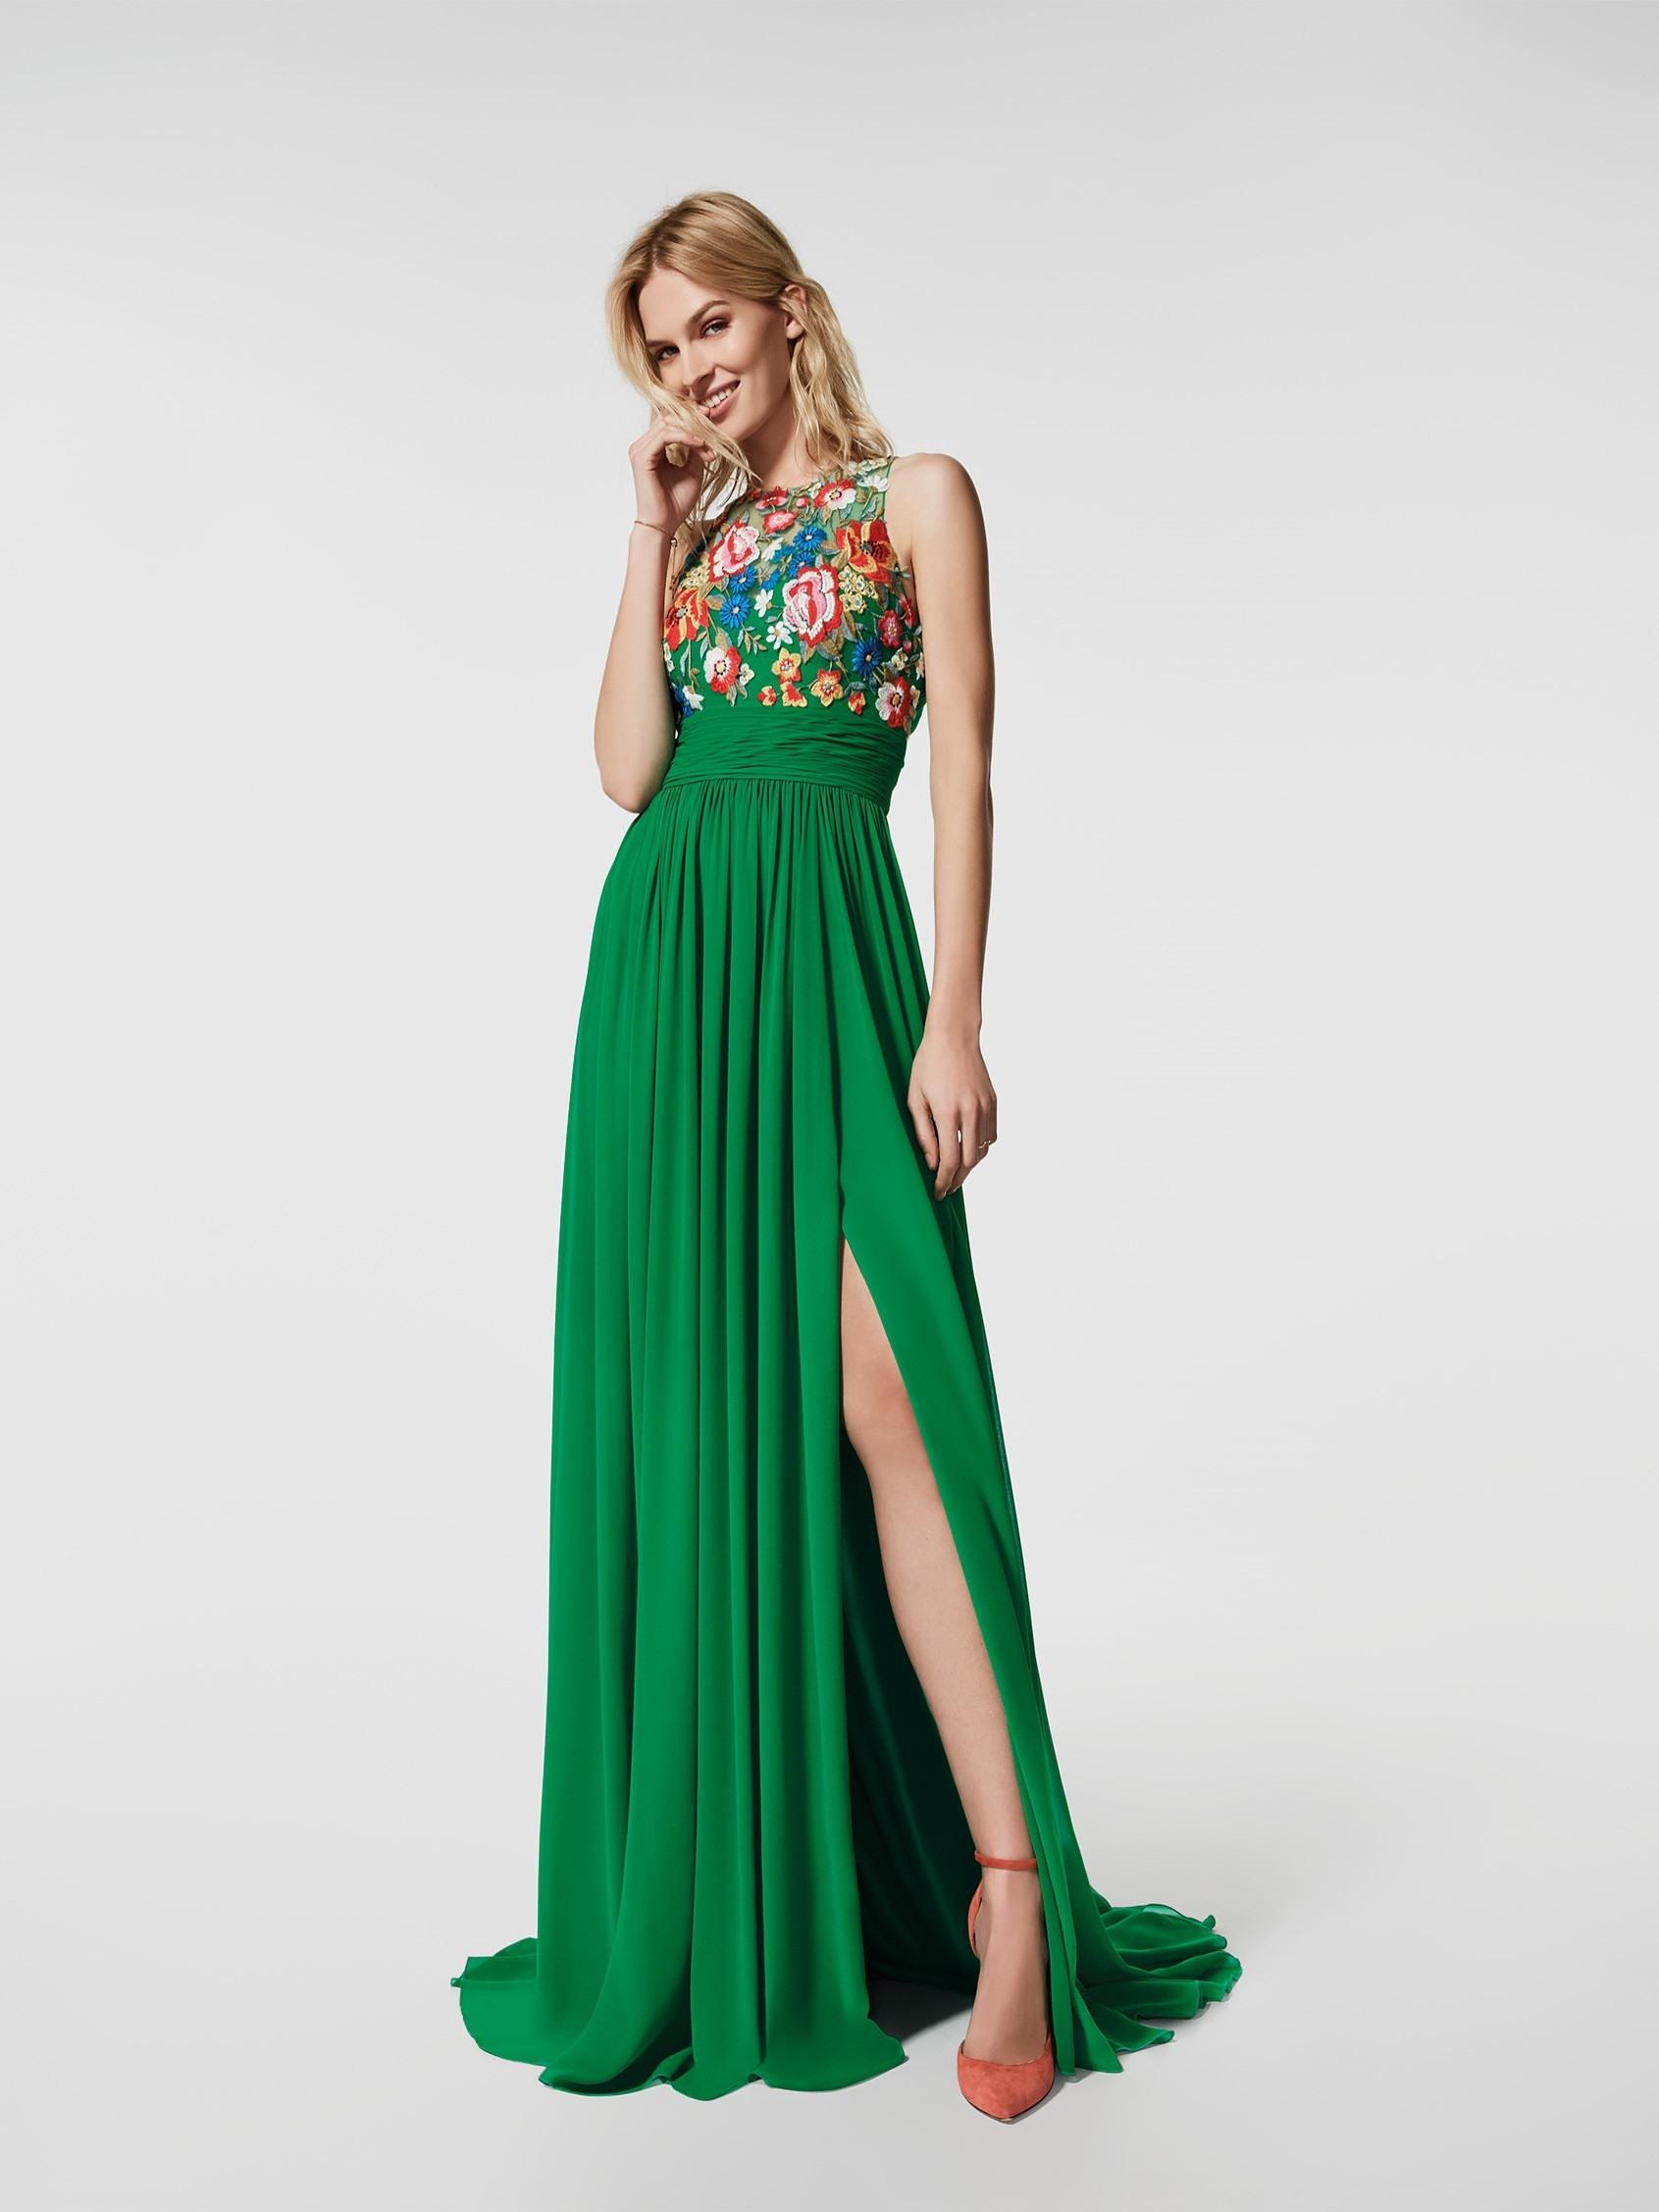 10 Top Abendkleid In Grün Lang Stylish13 Erstaunlich Abendkleid In Grün Lang Galerie